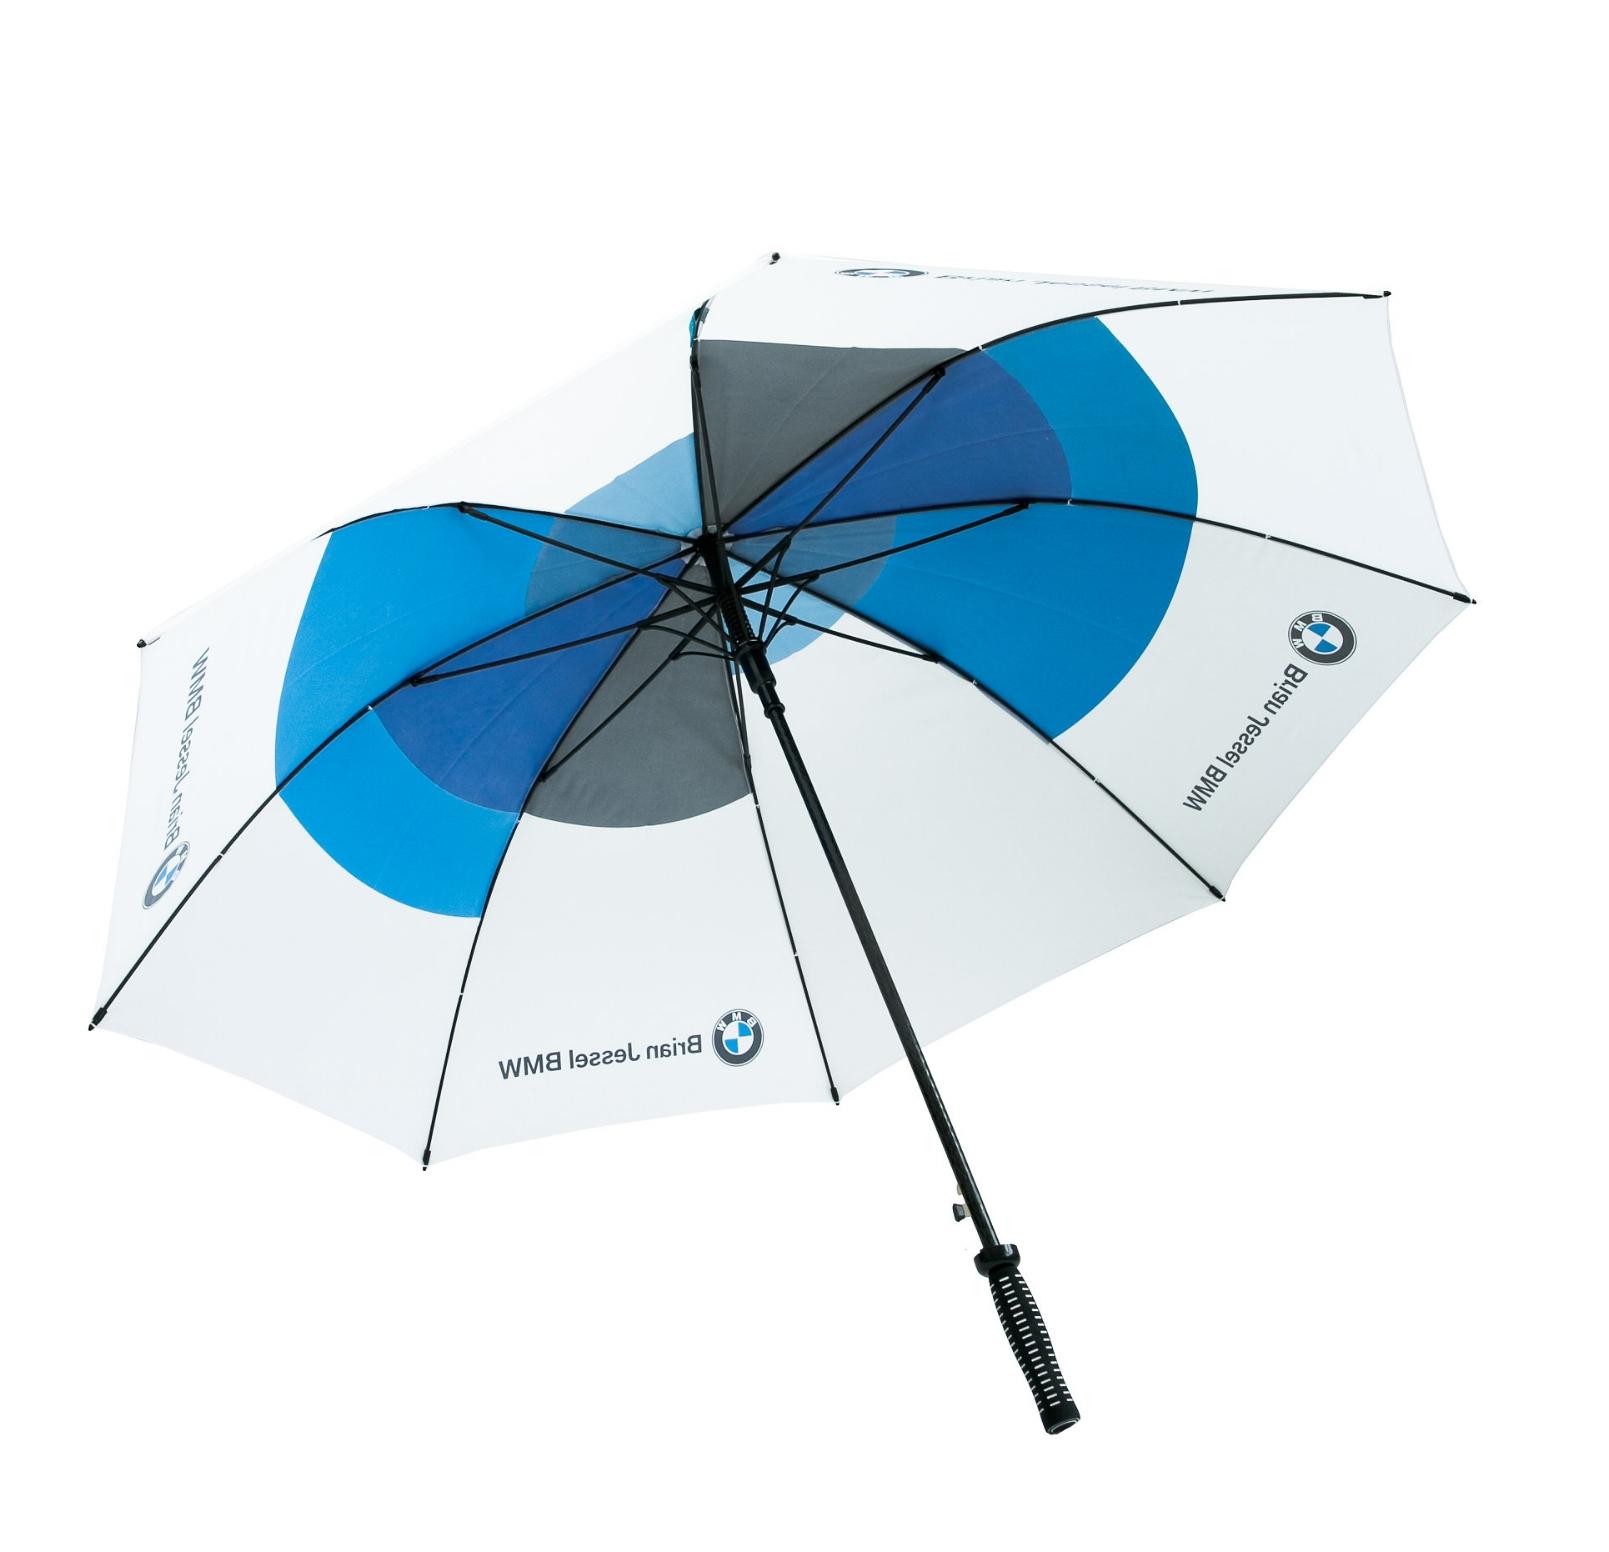 CUSTOM DESIGN UMBRELLAS | sample shown above: Concierge Golf Umbrella ( item #2088 )  sample logo-printed with Brian Jessel BMW  logo & 'all-over-printed' custom design graphic